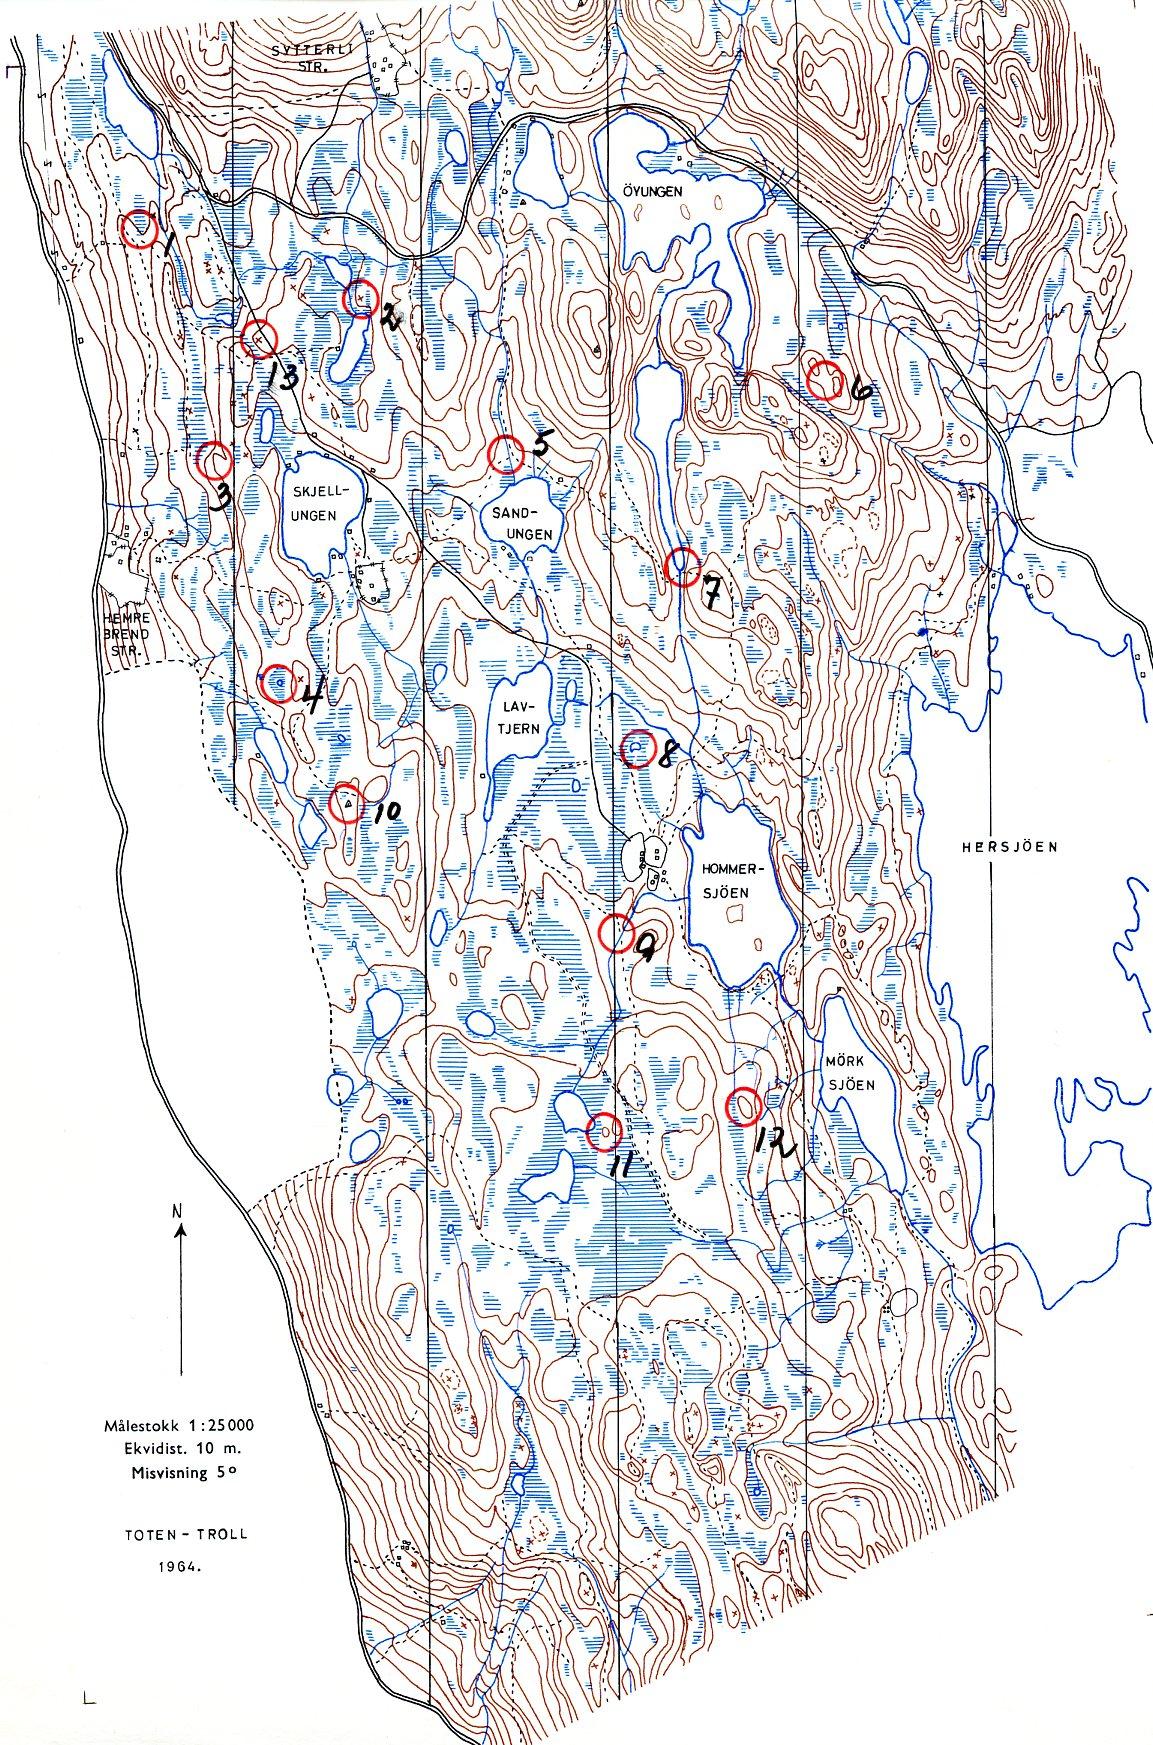 totenåsen kart Toten trimmen totenåsen kart